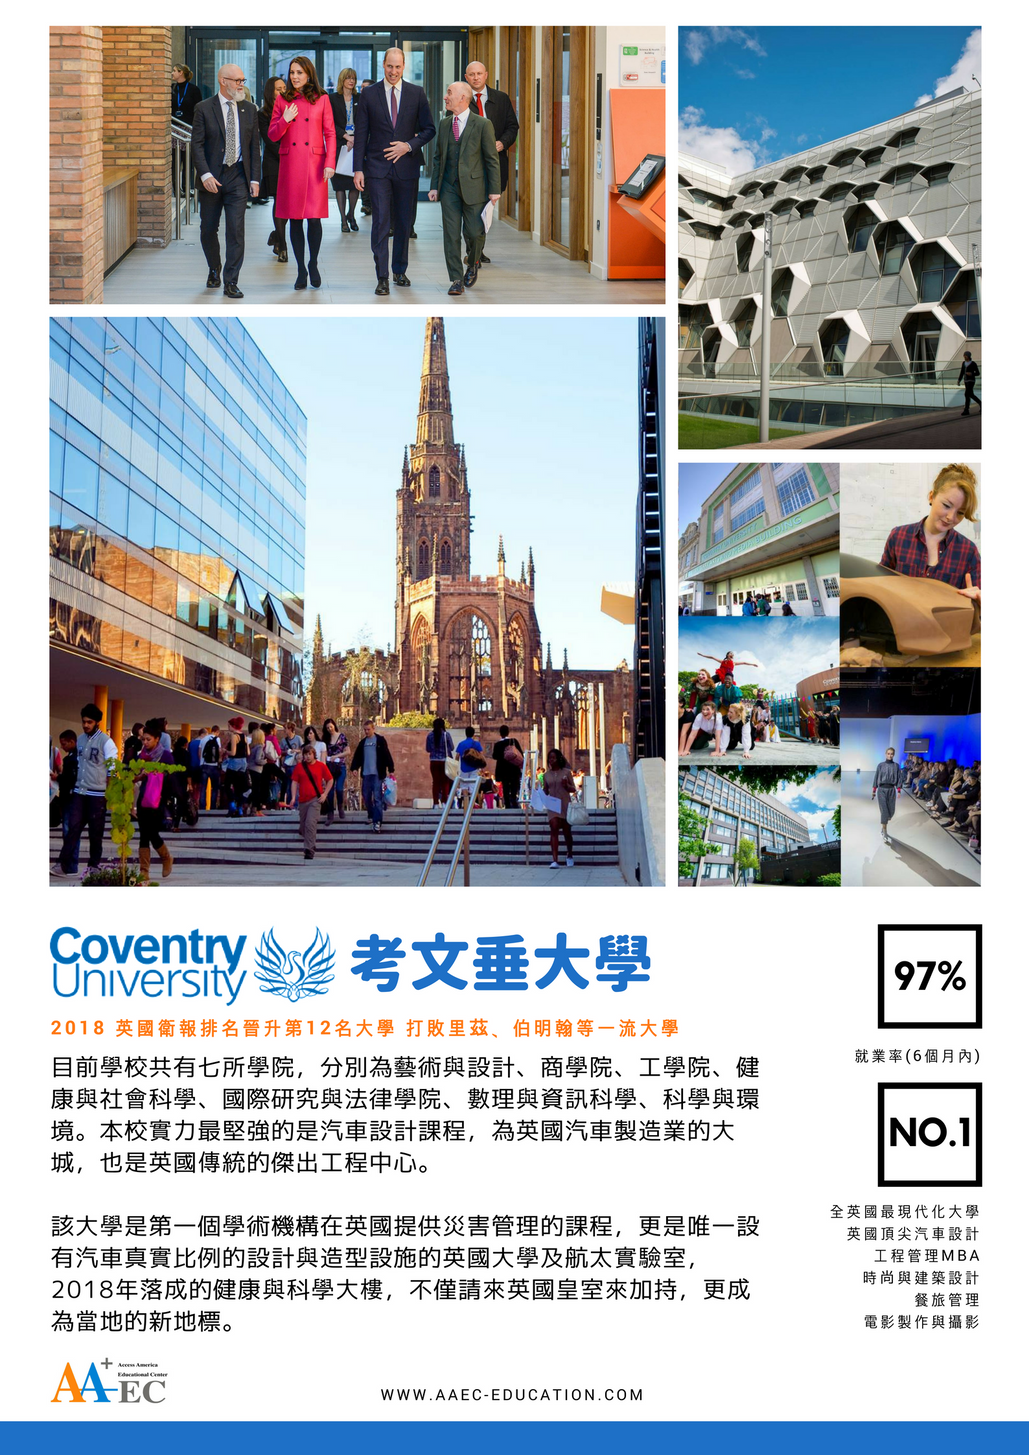 [學校簡介] Coventry University